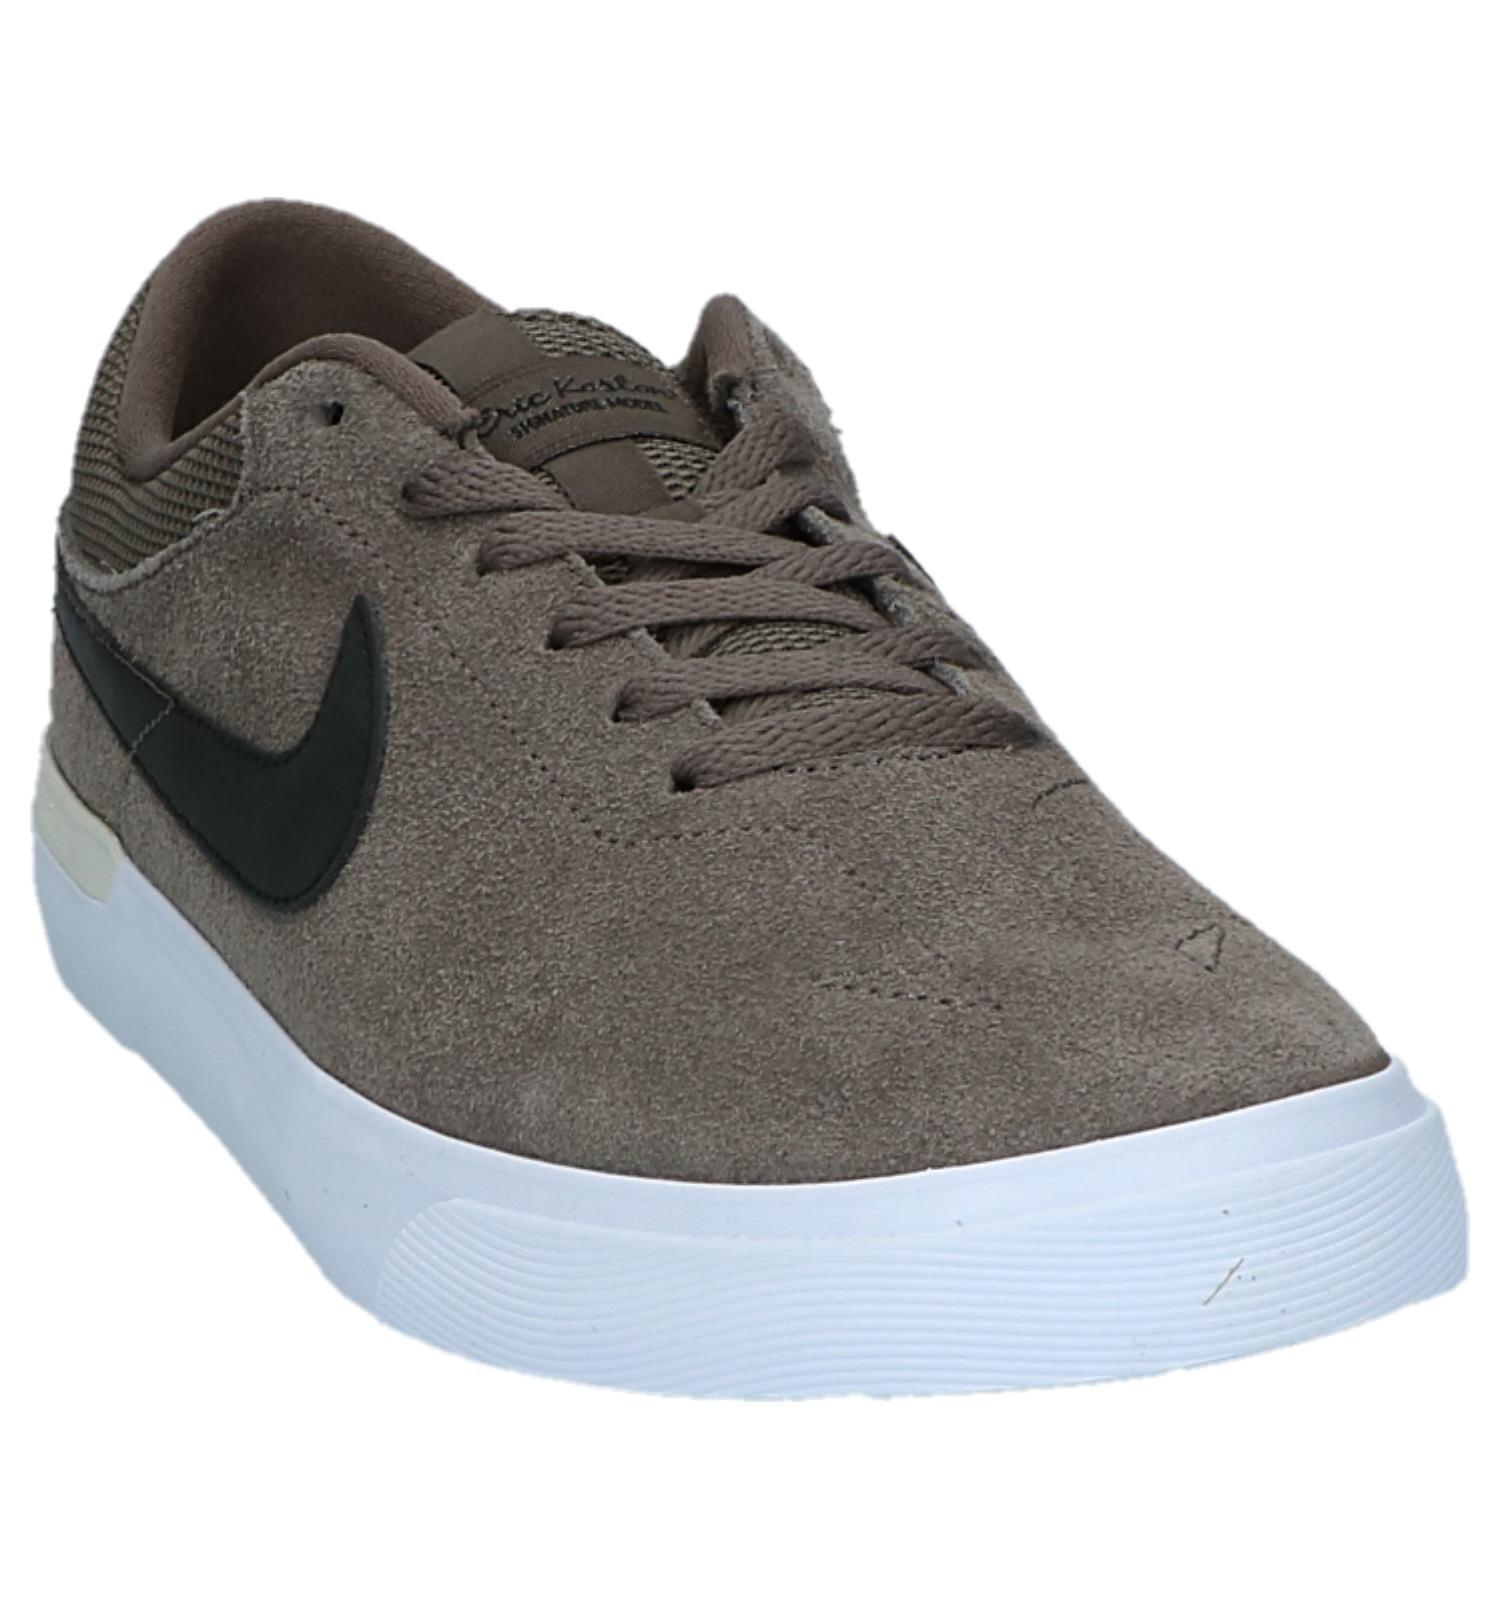 Hypervulc Sb Lage Sportieve Sneakers Taupe Nike BdoxeC